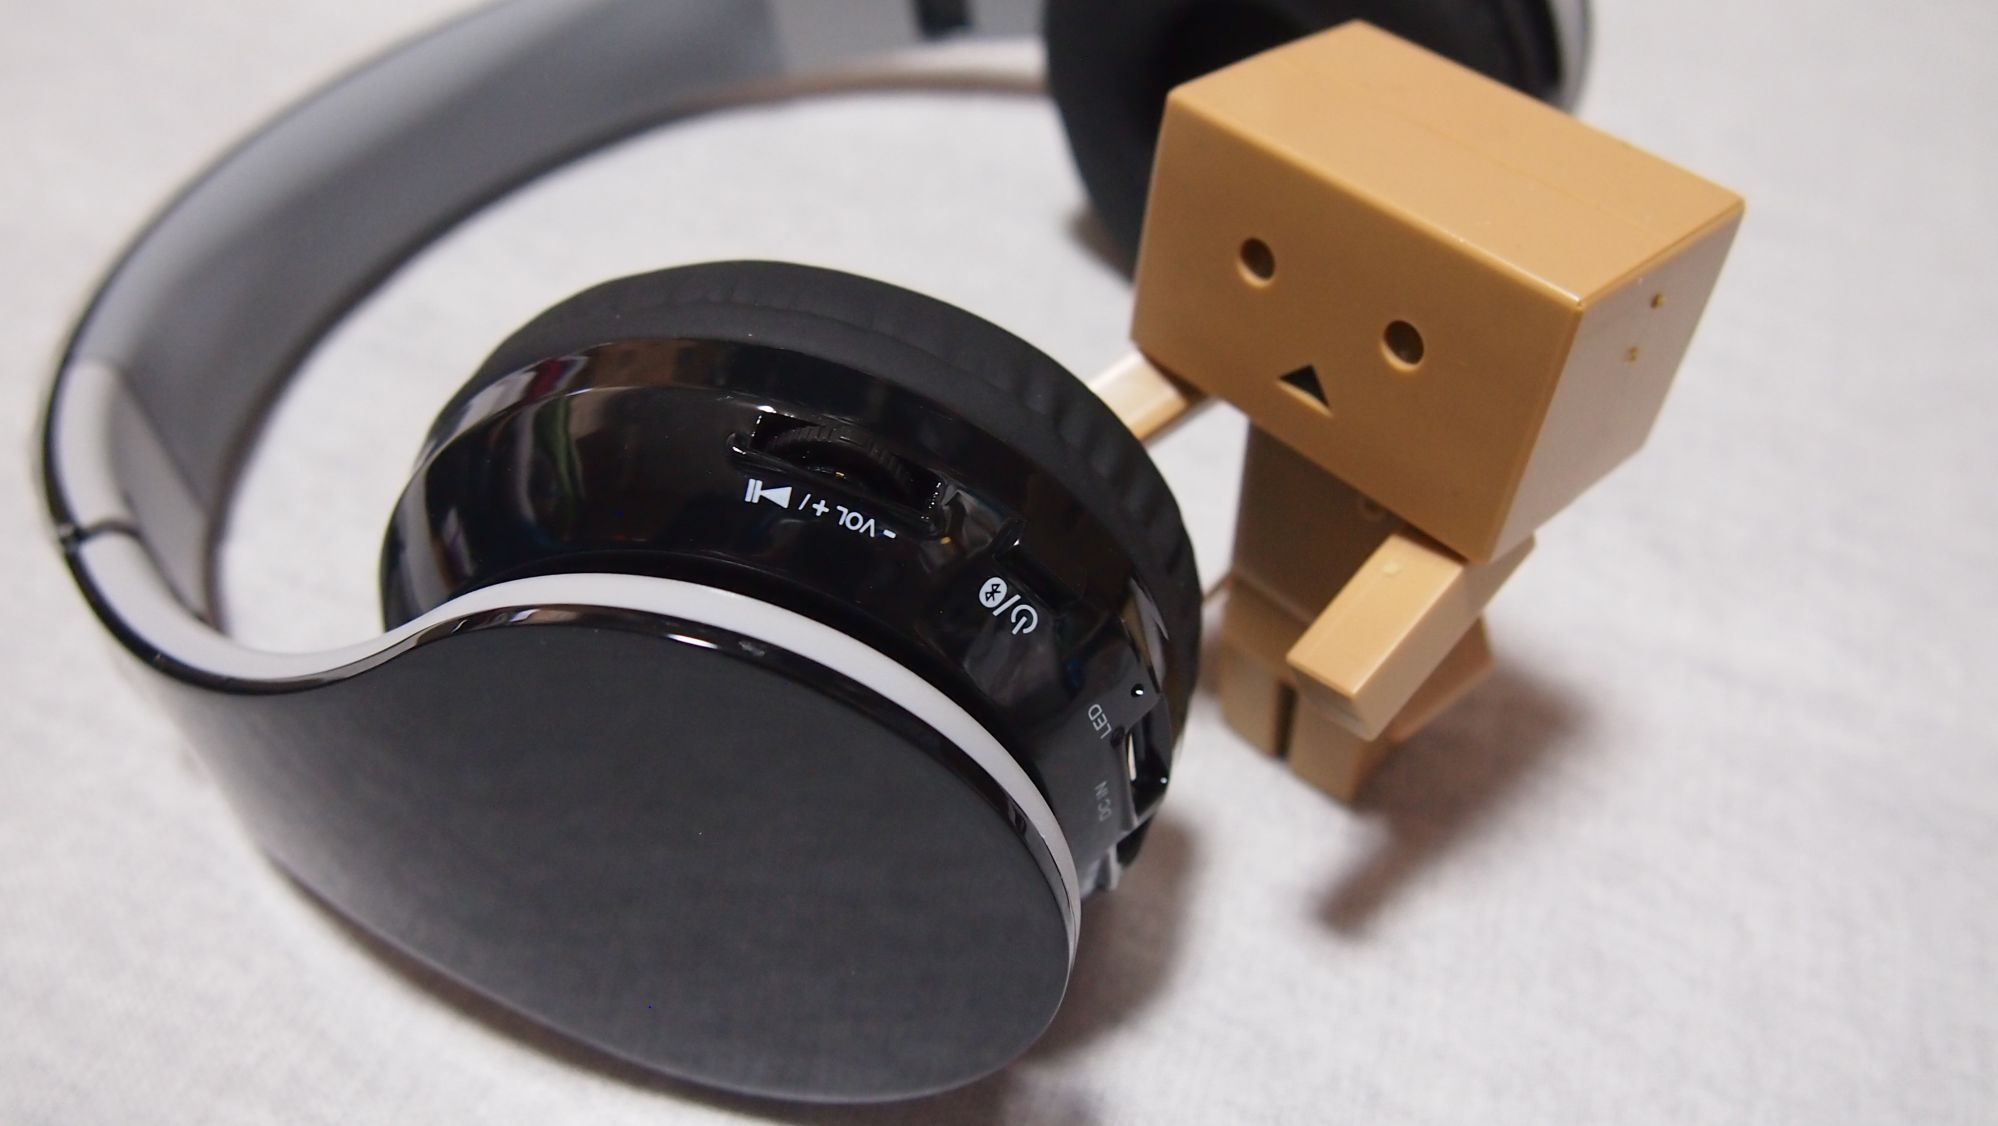 Dylan Bluetooth ヘッドホン 4.1 スステレオ オンイヤー